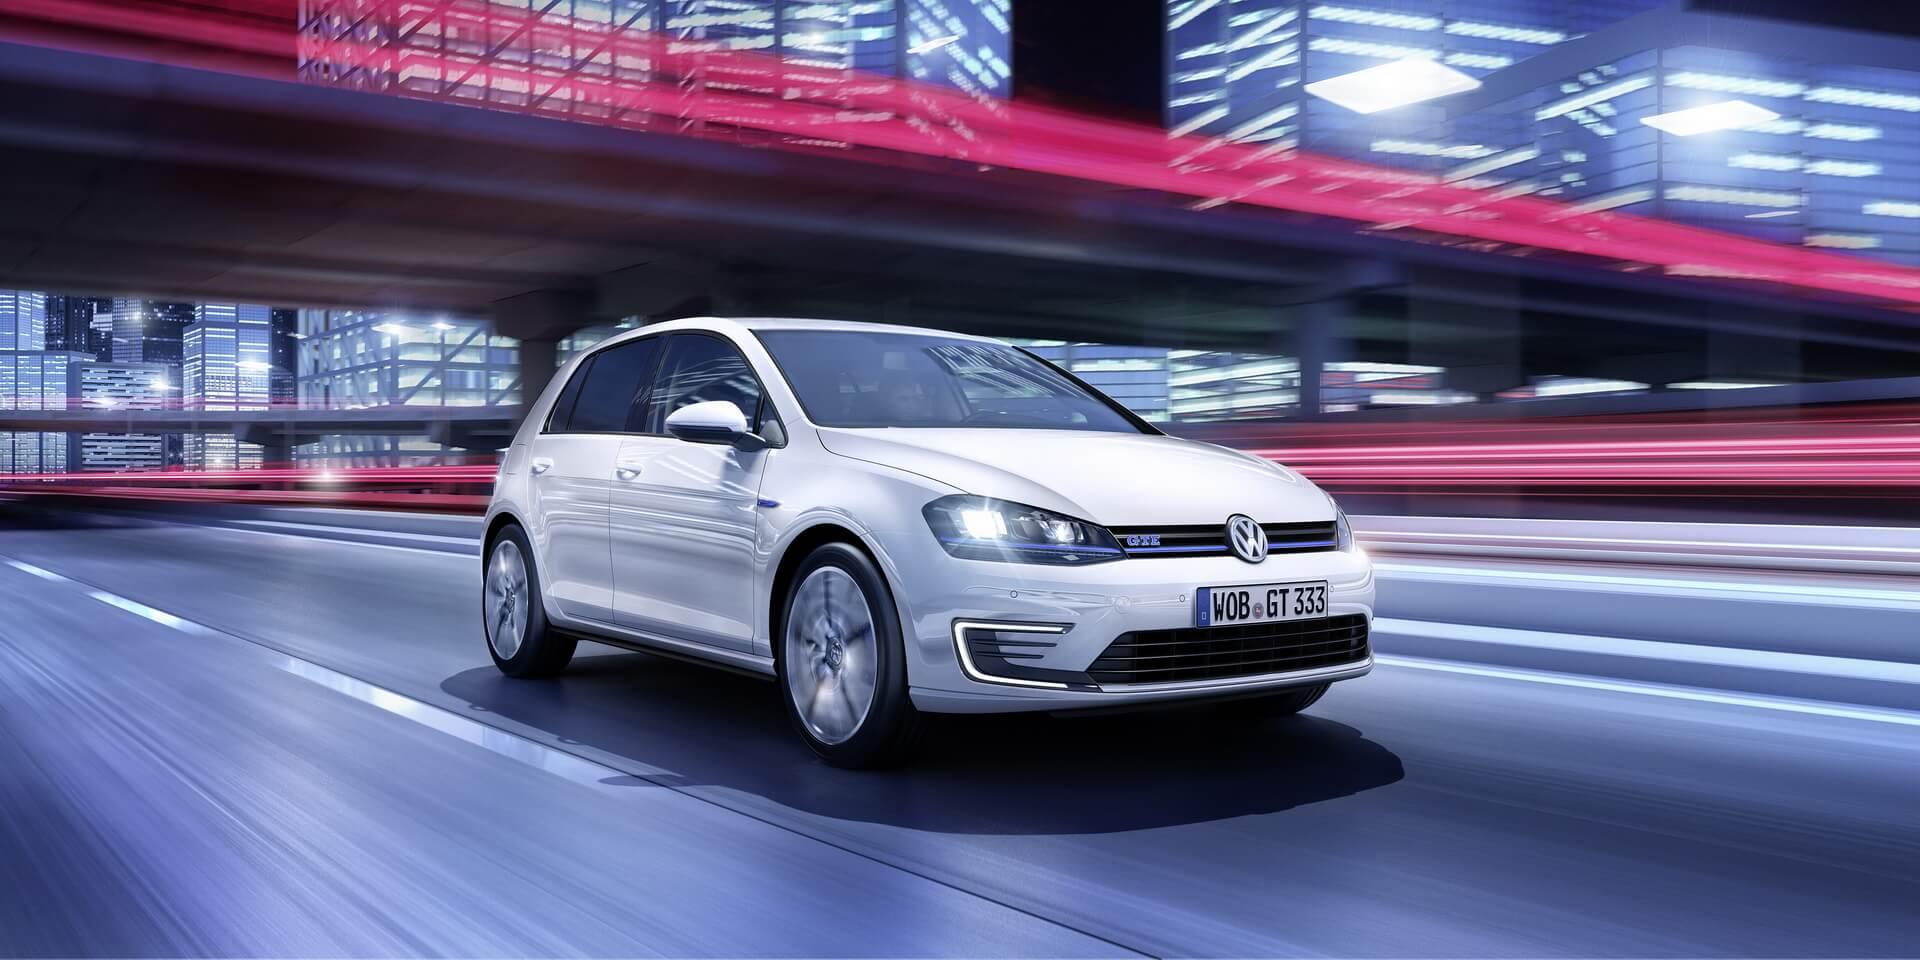 Плагин-гибрид Volkswagen Golf GTE